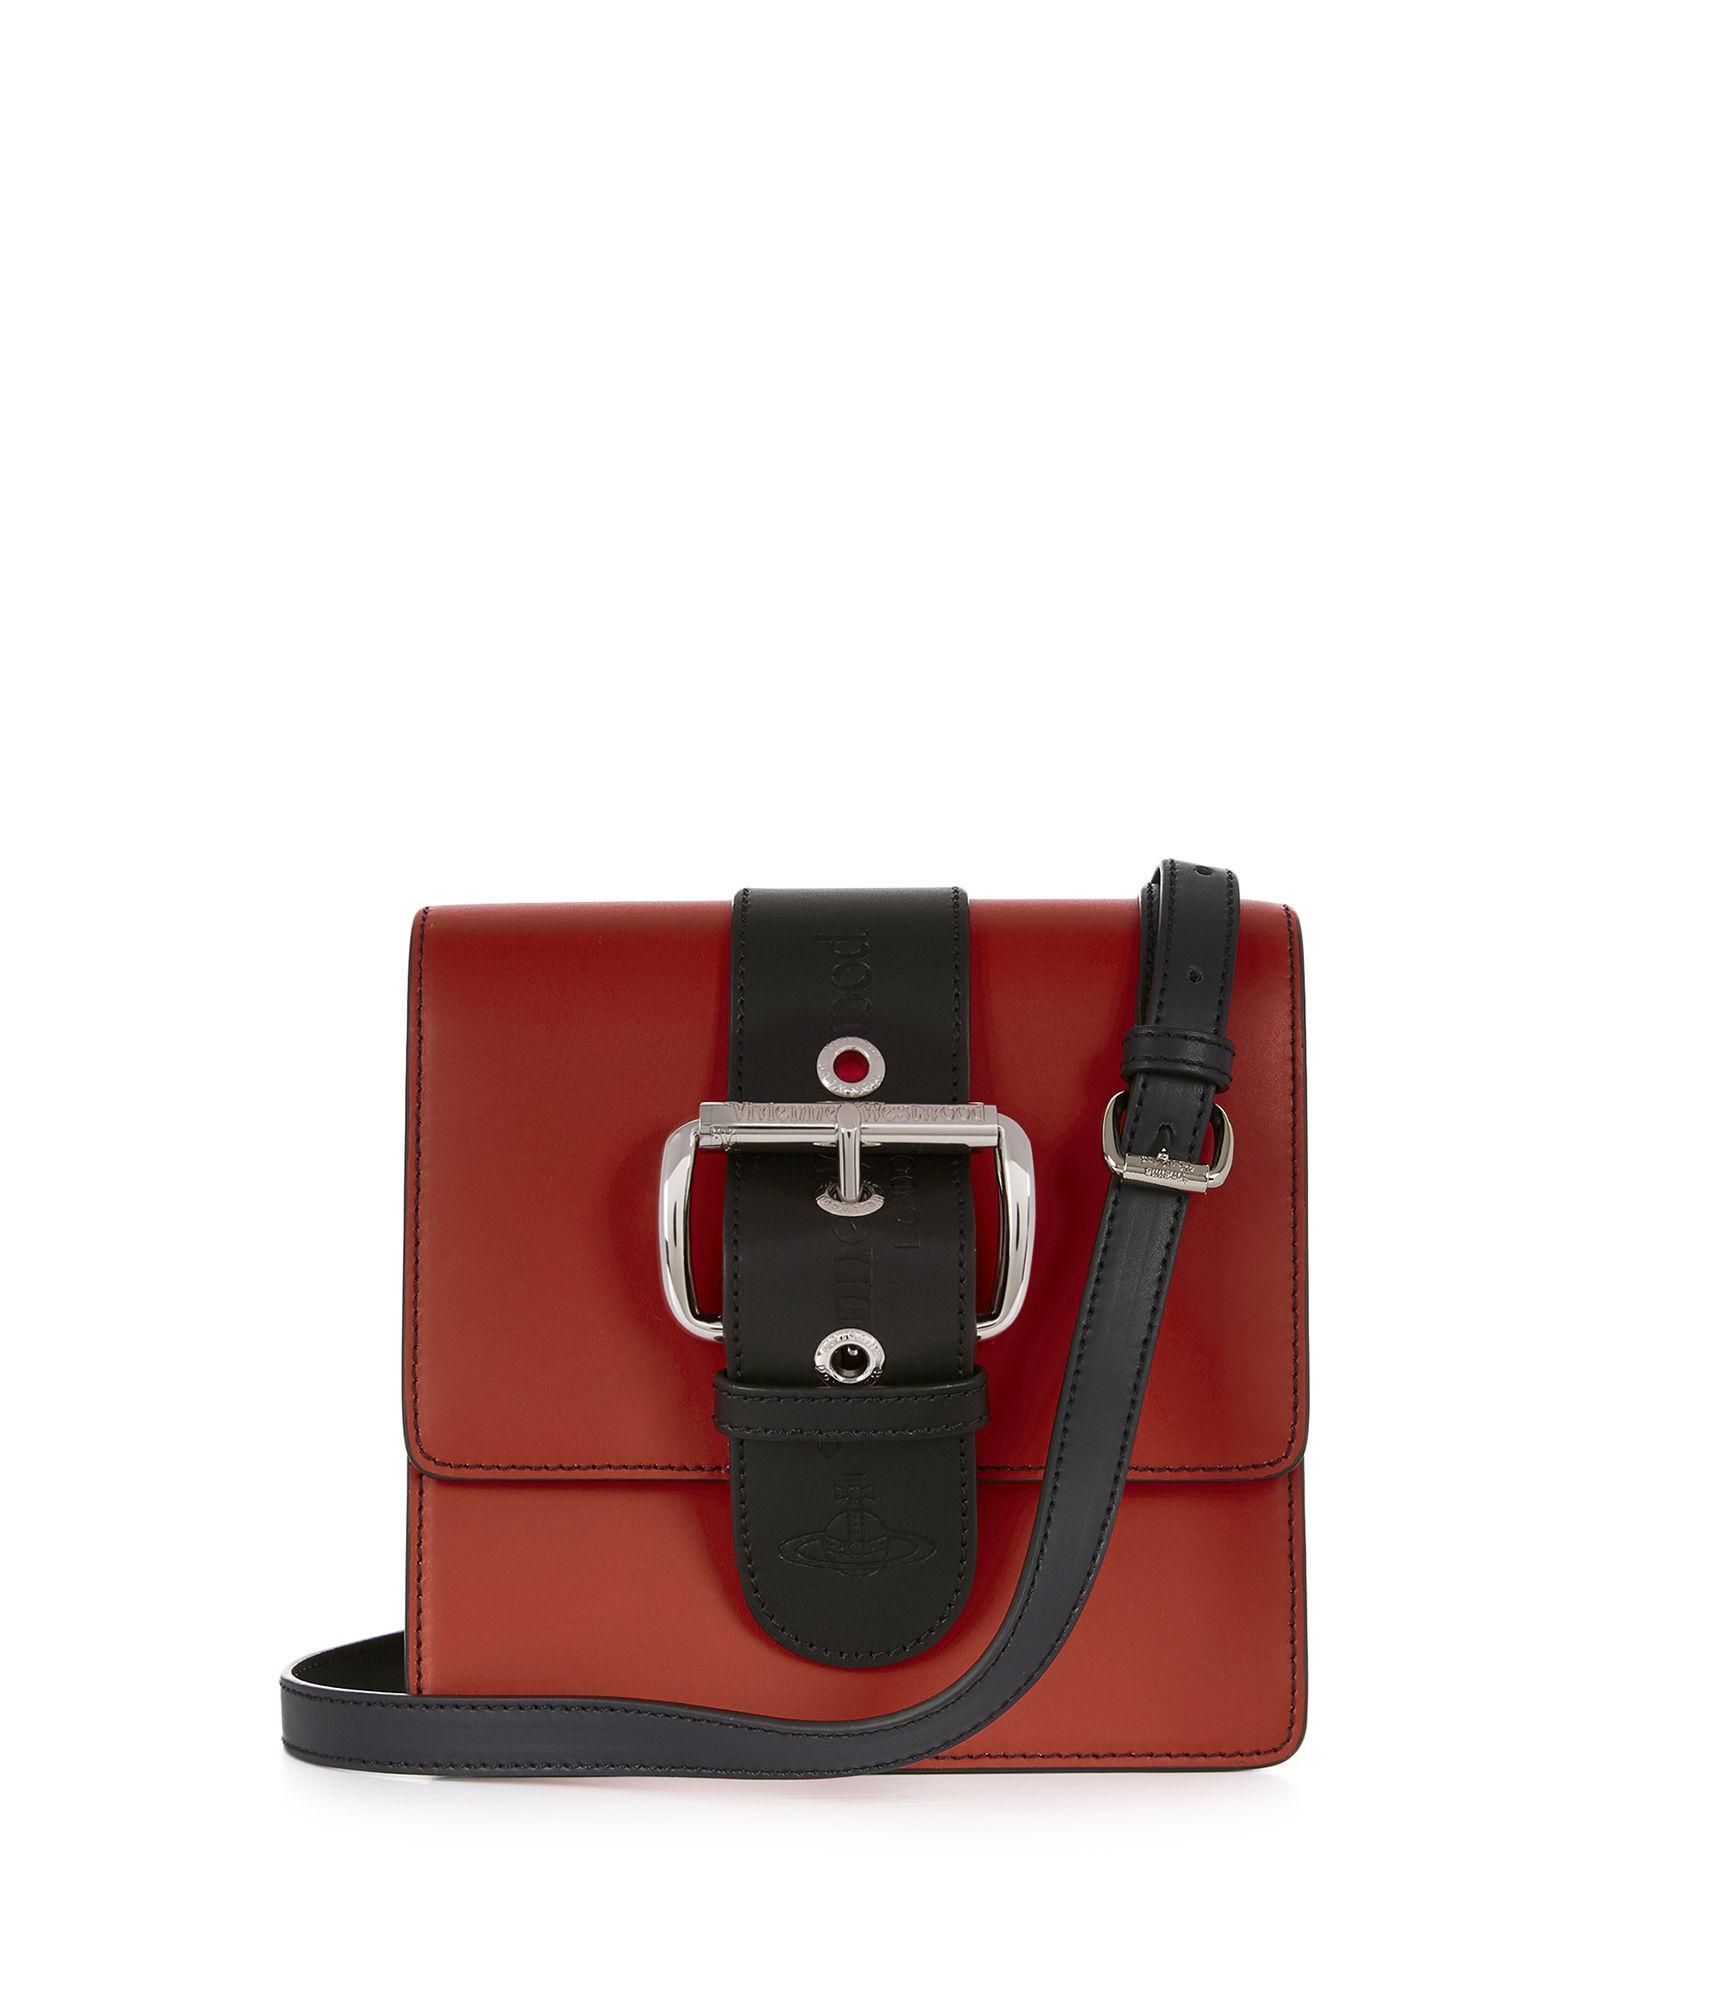 Vivienne Westwood Small Alex Handbag 42010033 Red